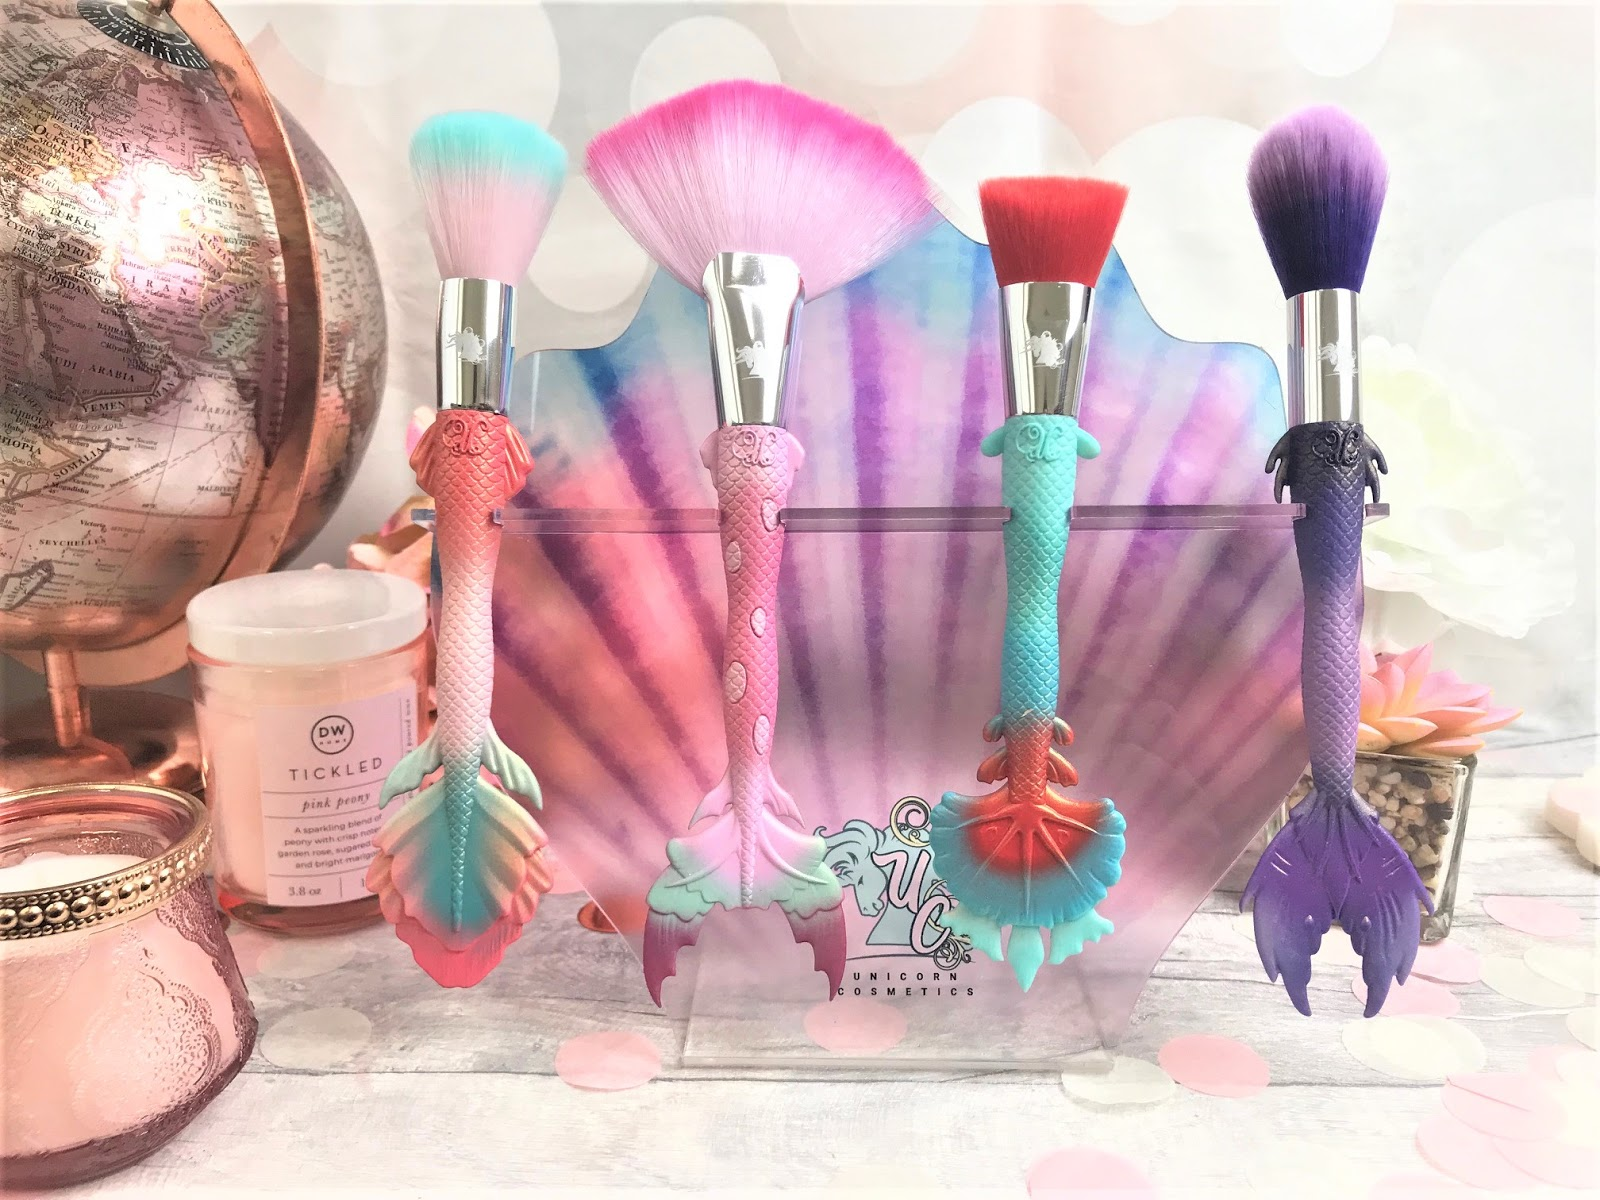 How to Reach Unicorn Cosmetics Customer Service